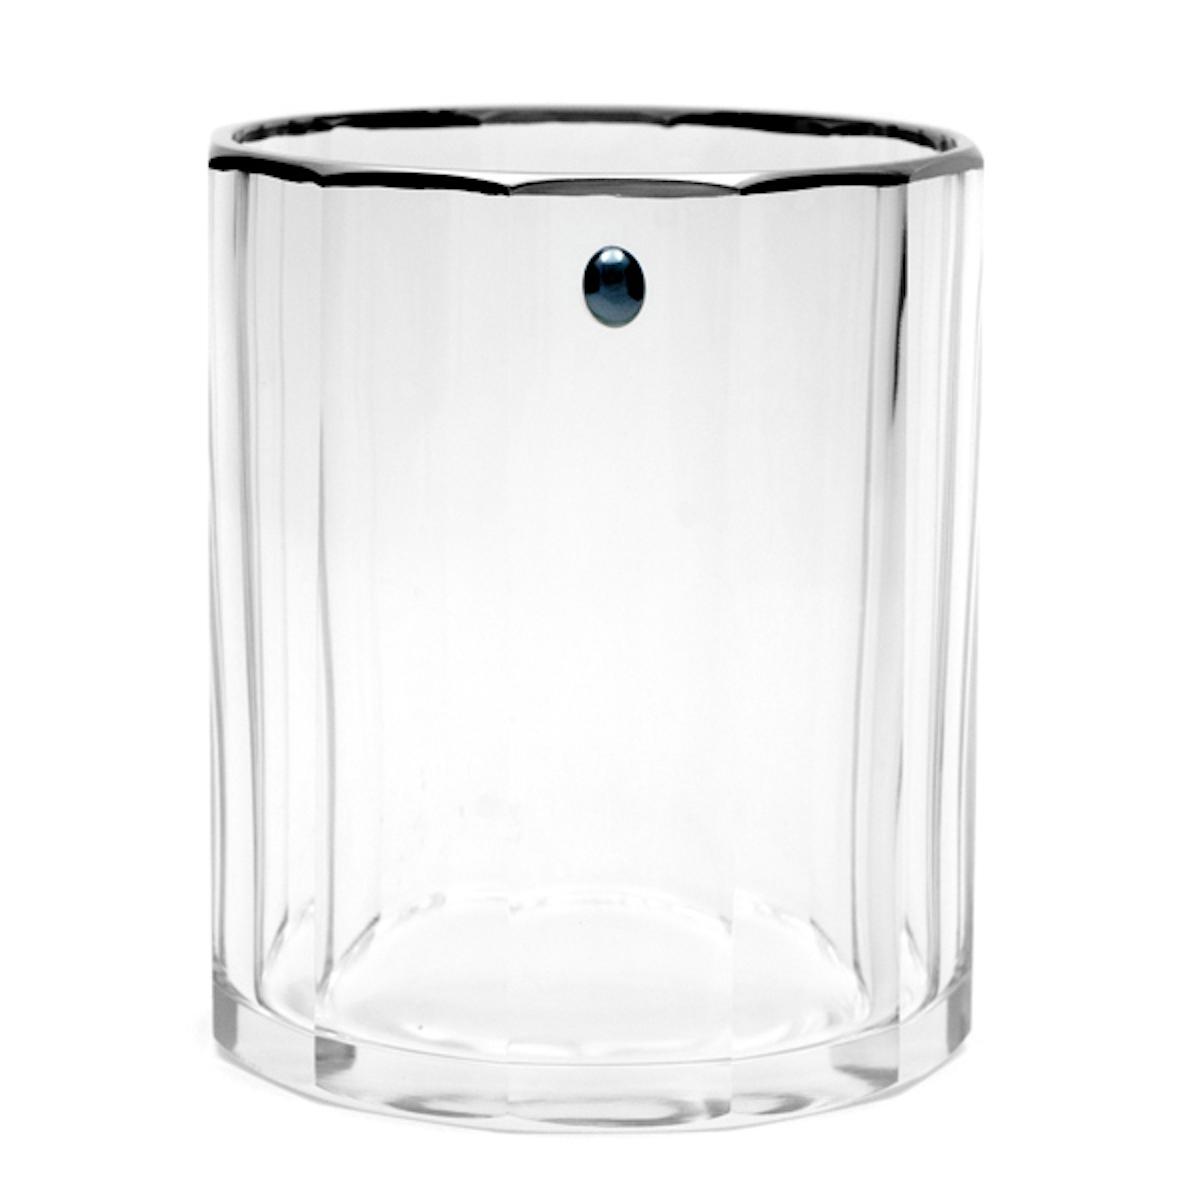 vera_water_glass_handmade_designer_giberto_luxury_platinum_rim_precious_stone